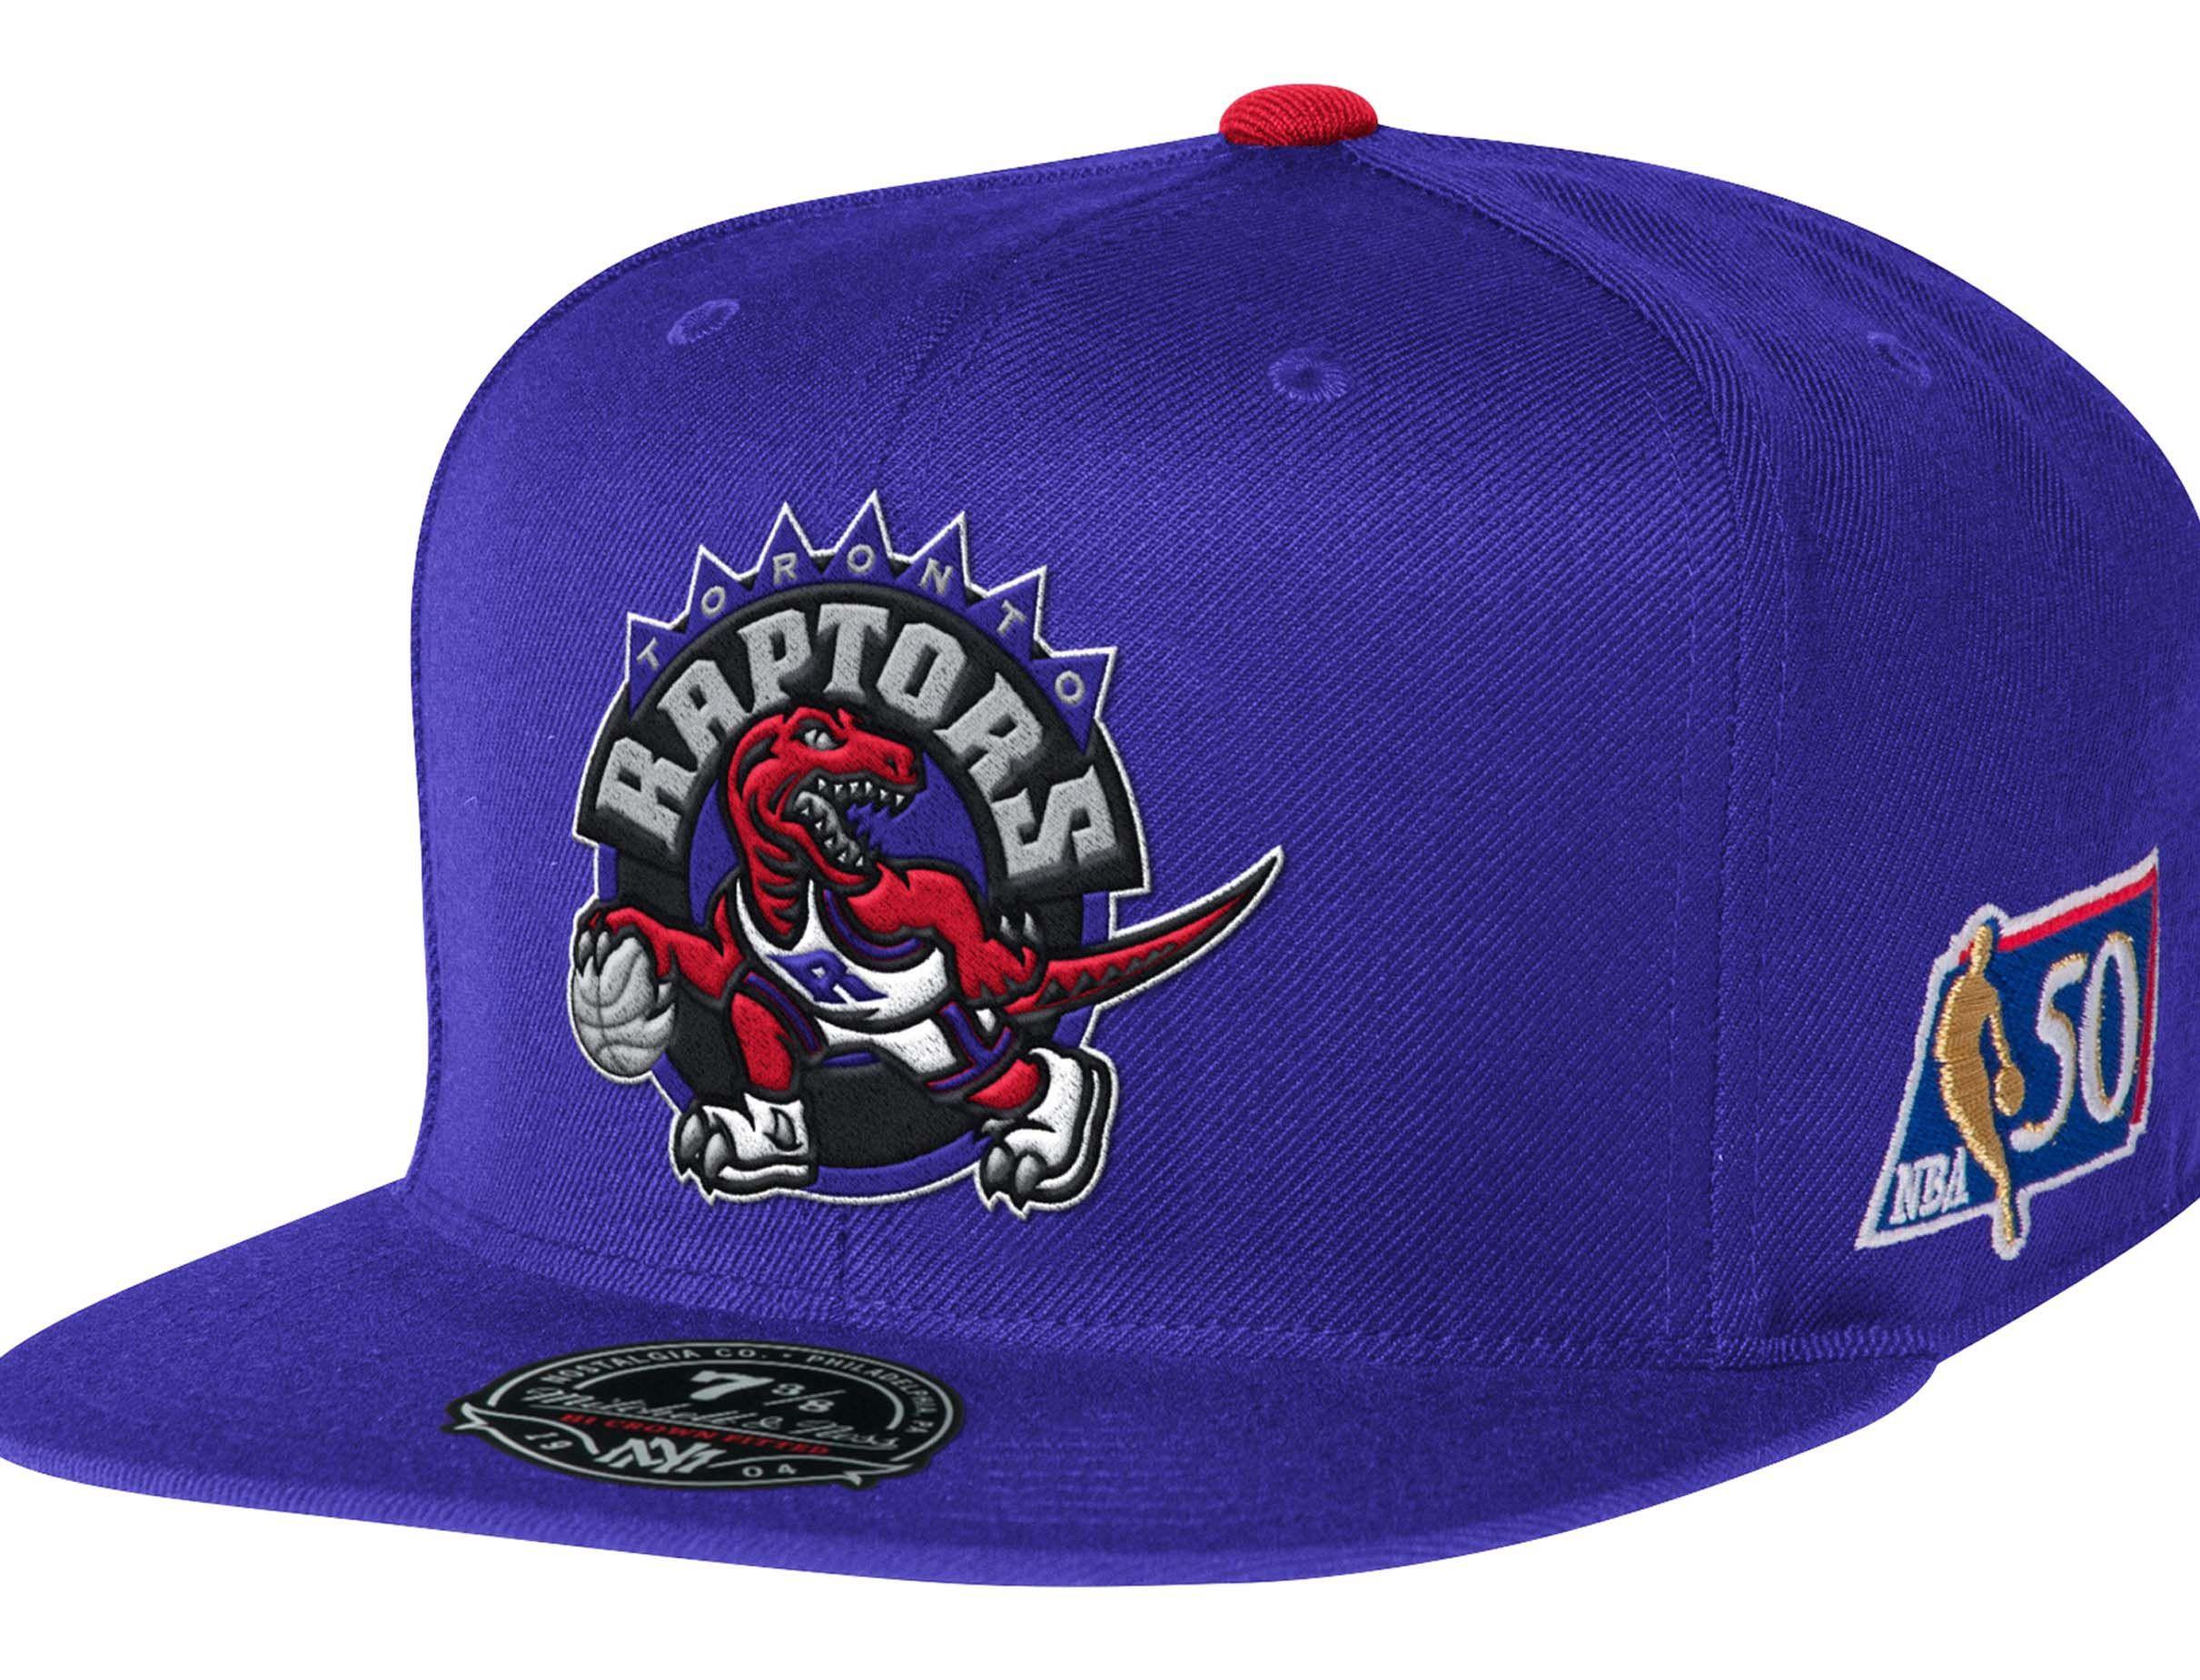 39959d420a5 Toronto Raptors NBA 50th Anniversary High Crown Fitted Baseball Cap by  MITCHELL   NESS x NBA